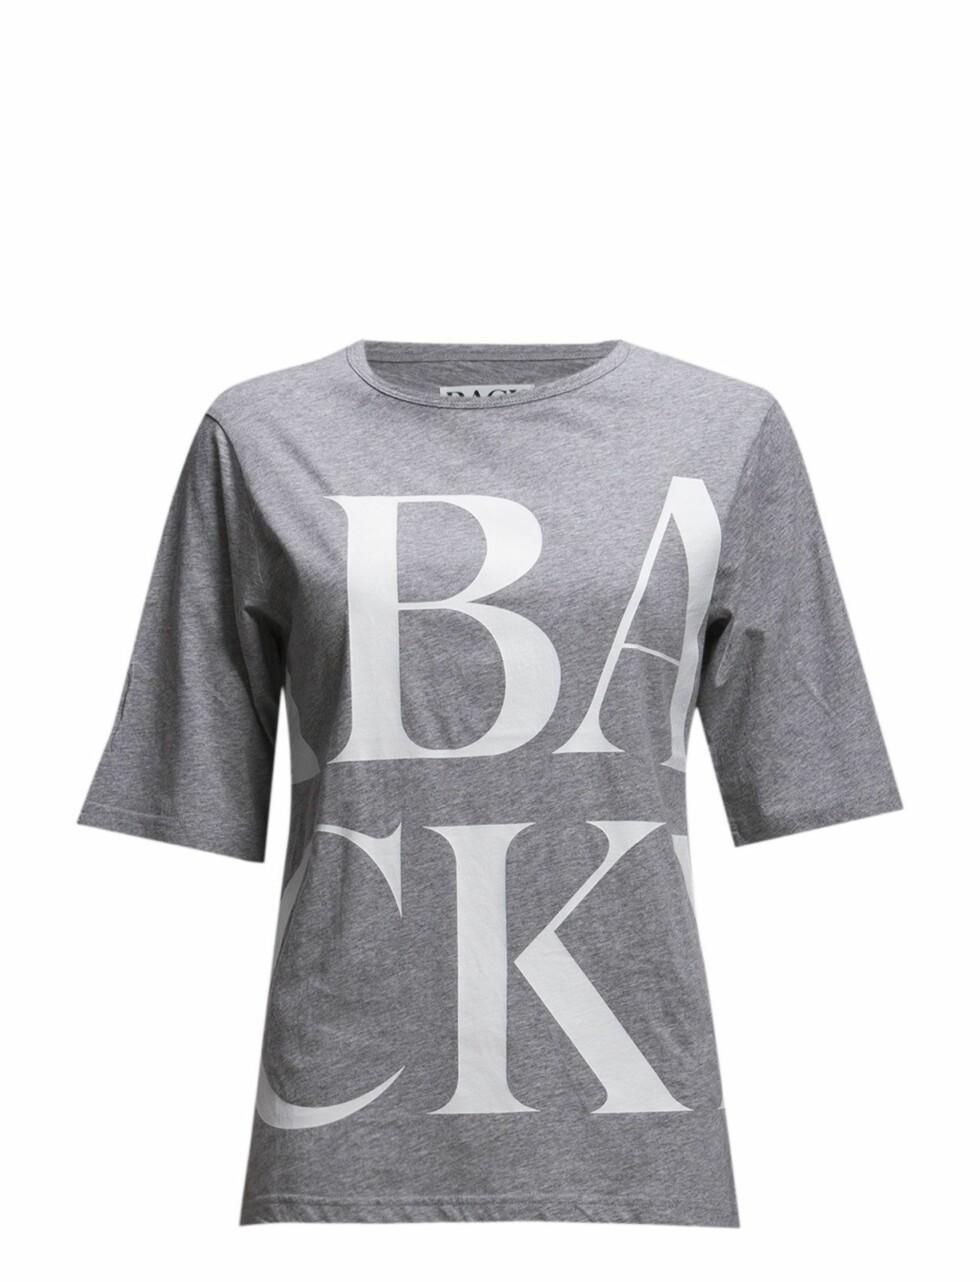 .T-skjorte fra BACK via Boozt.com, kr  Foto: Boozt.com